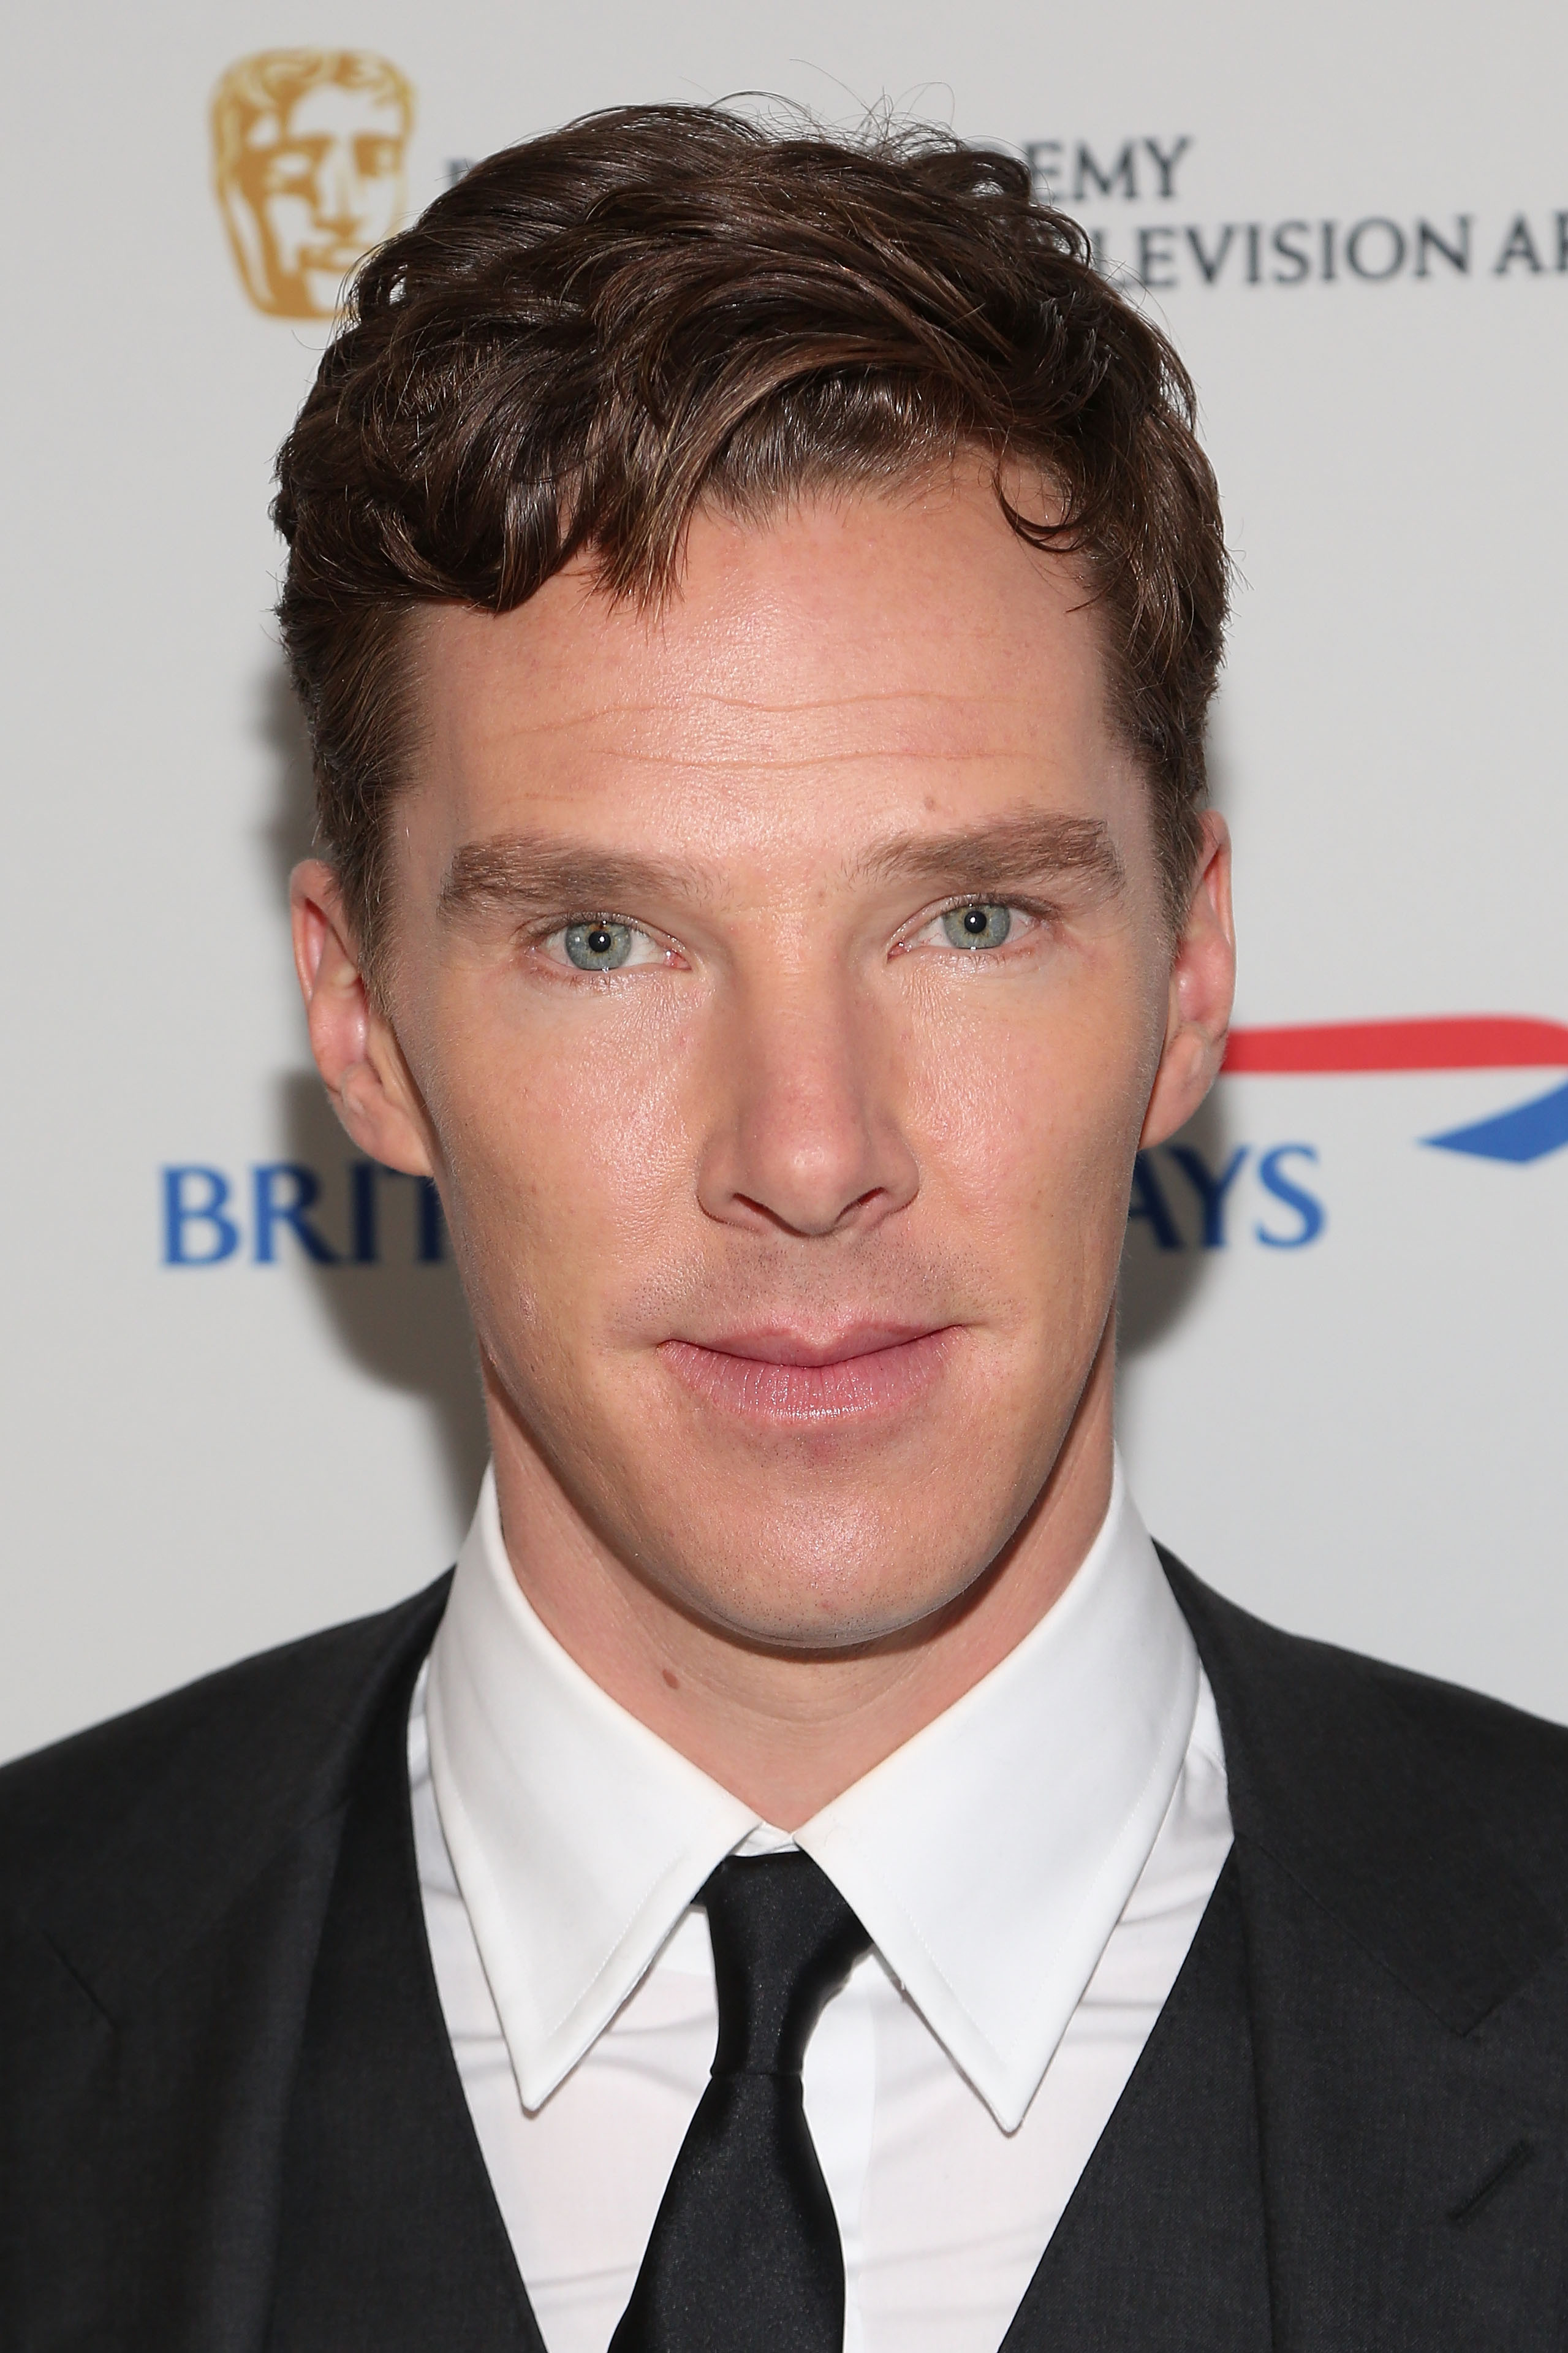 Teen Instagrammer Looks Exactly Like Benedict Cumberbatch